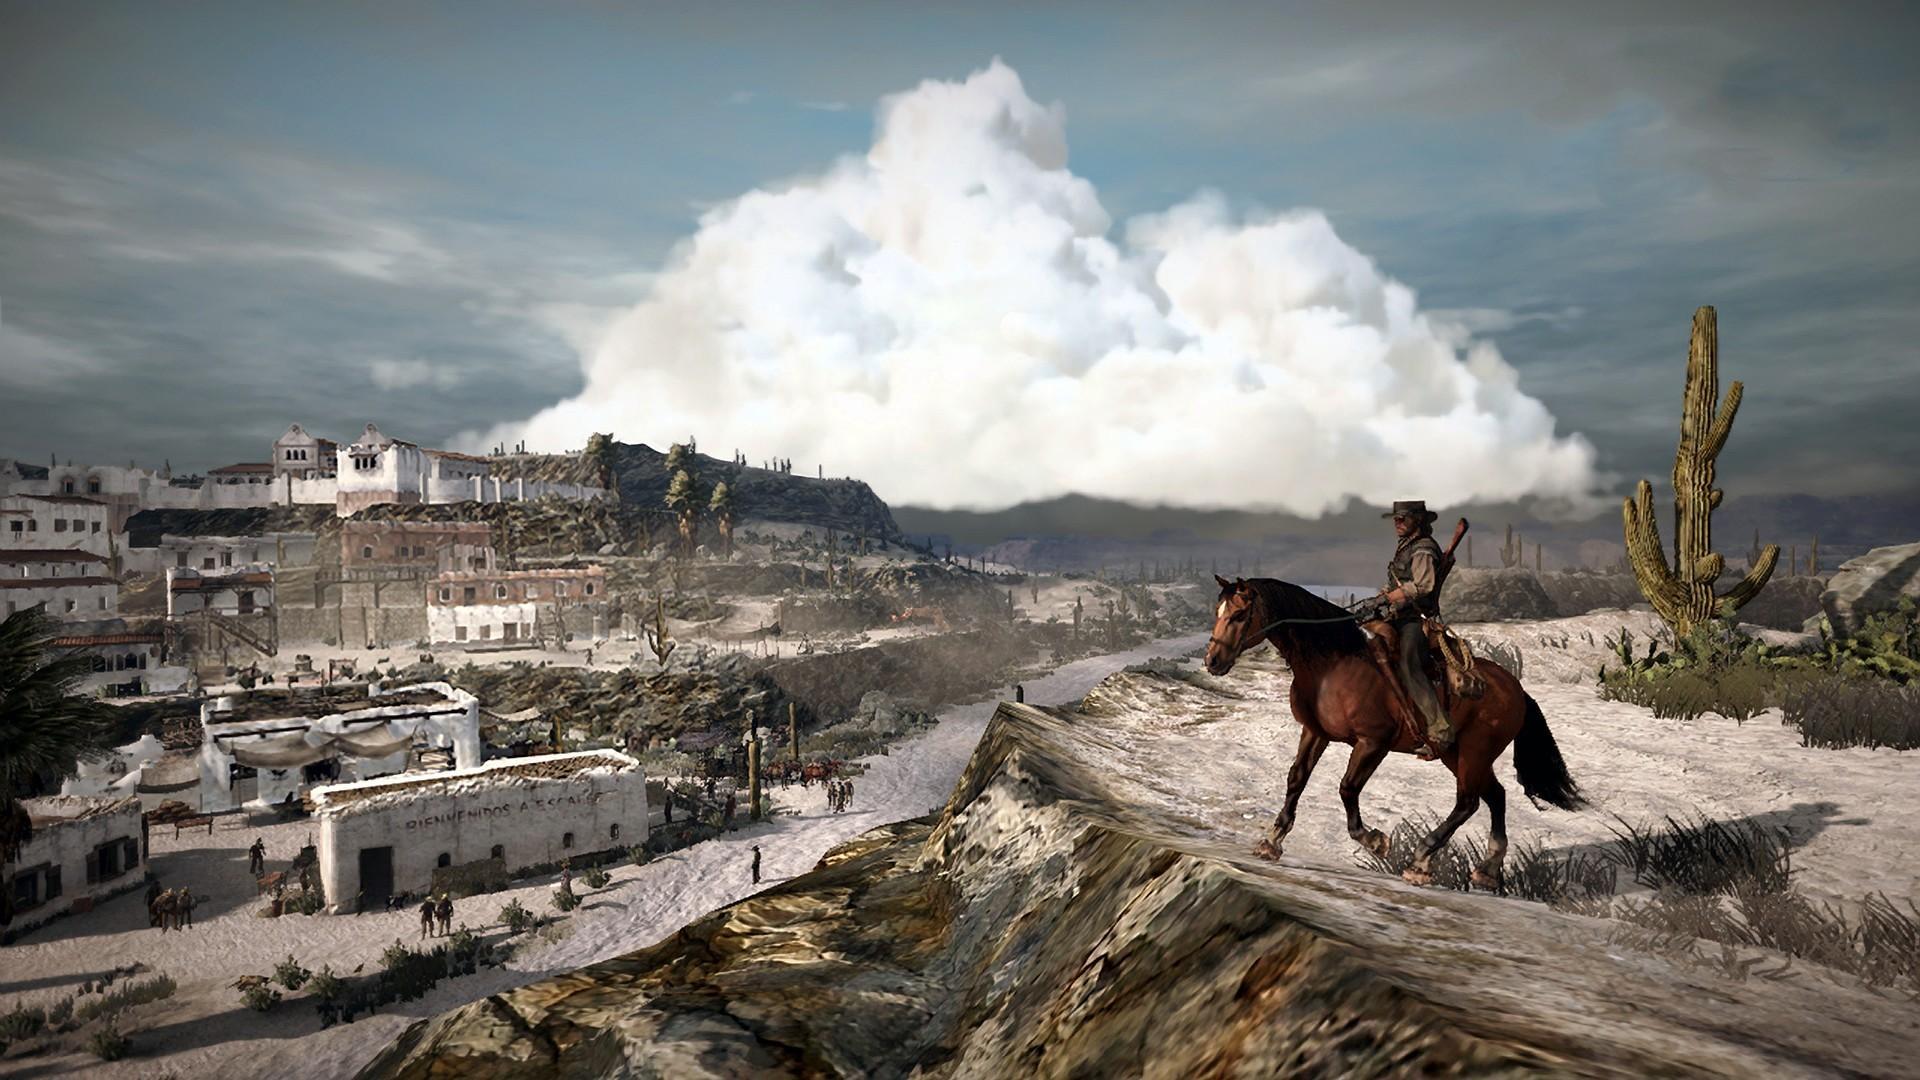 Red Dead Redemption 2 Wallpaper Hd 14